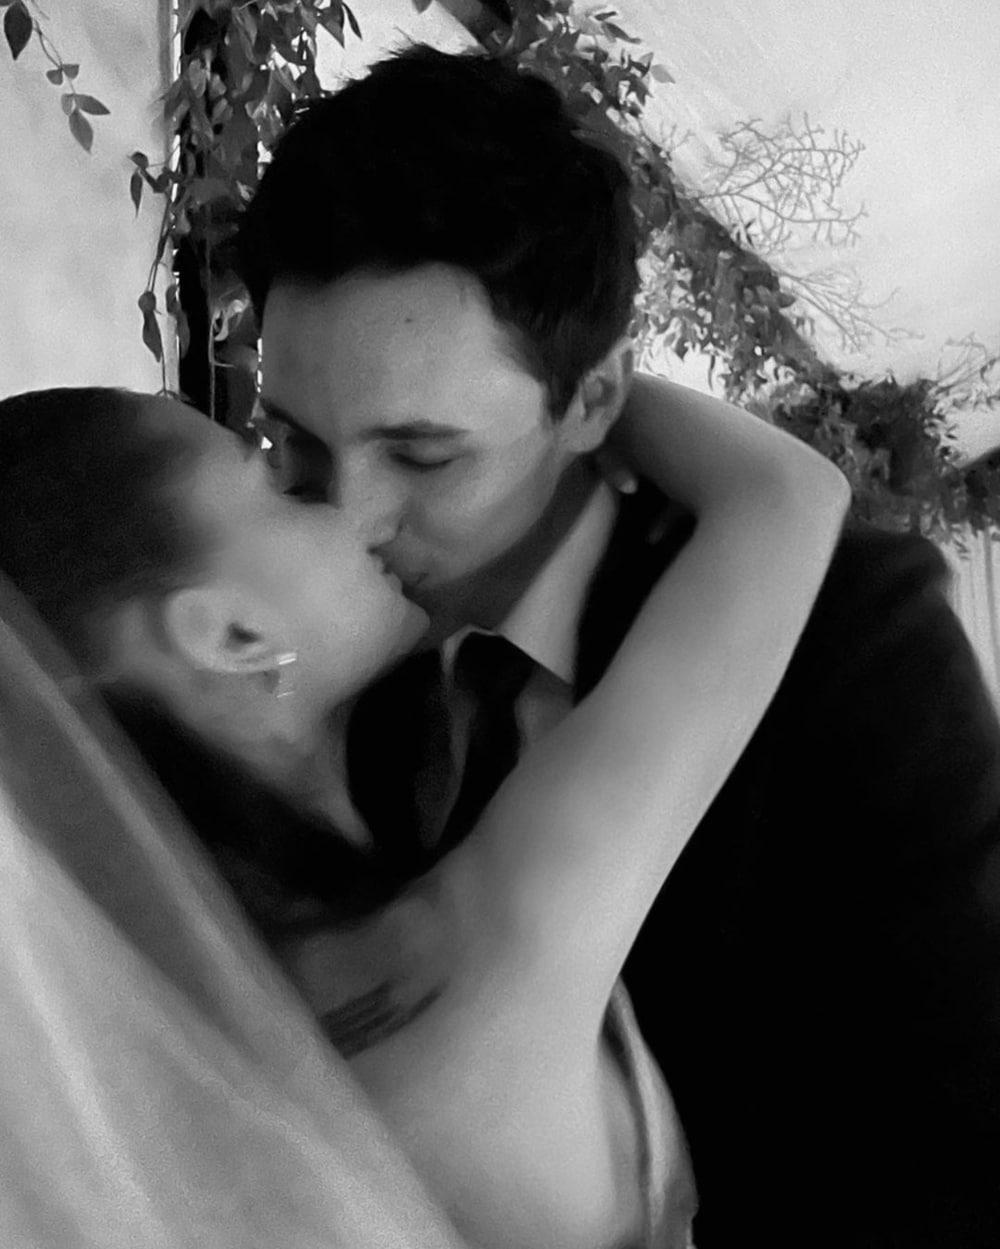 Potret Mesra Pernikahan Ariana Grande Dan Dalton Gomez